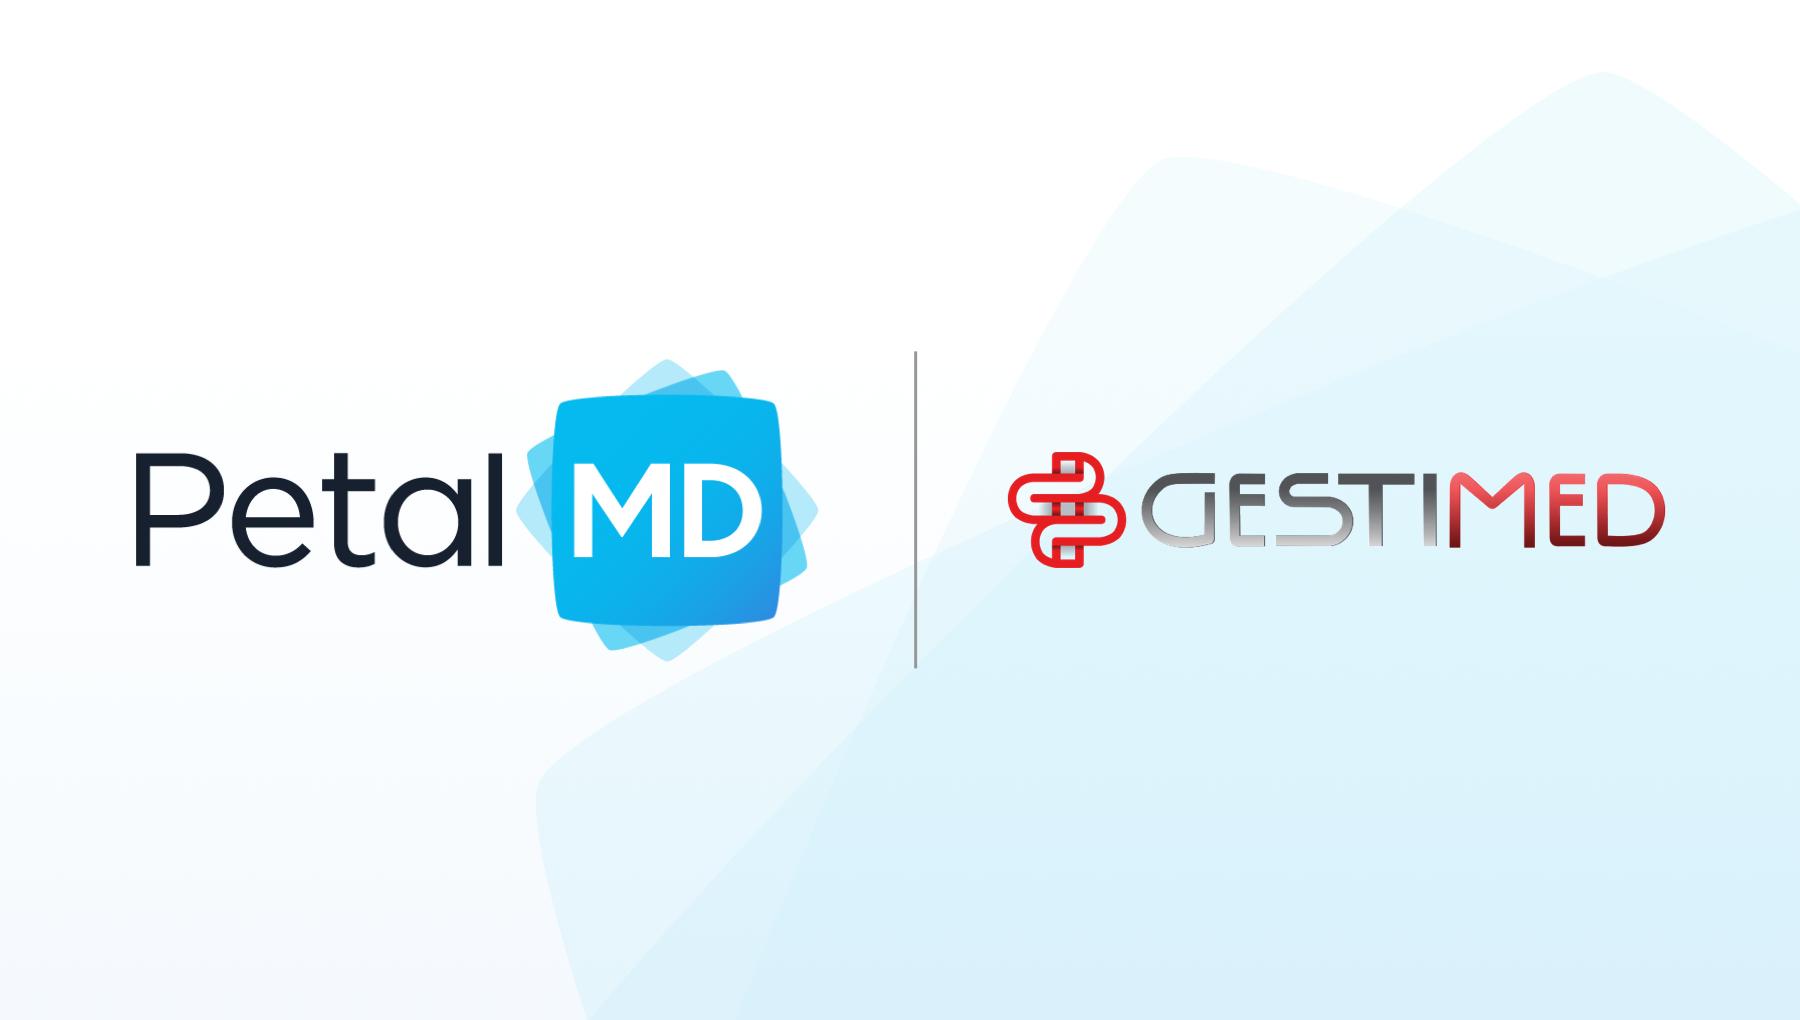 BC - PetalMD - Gestimed Acquisition